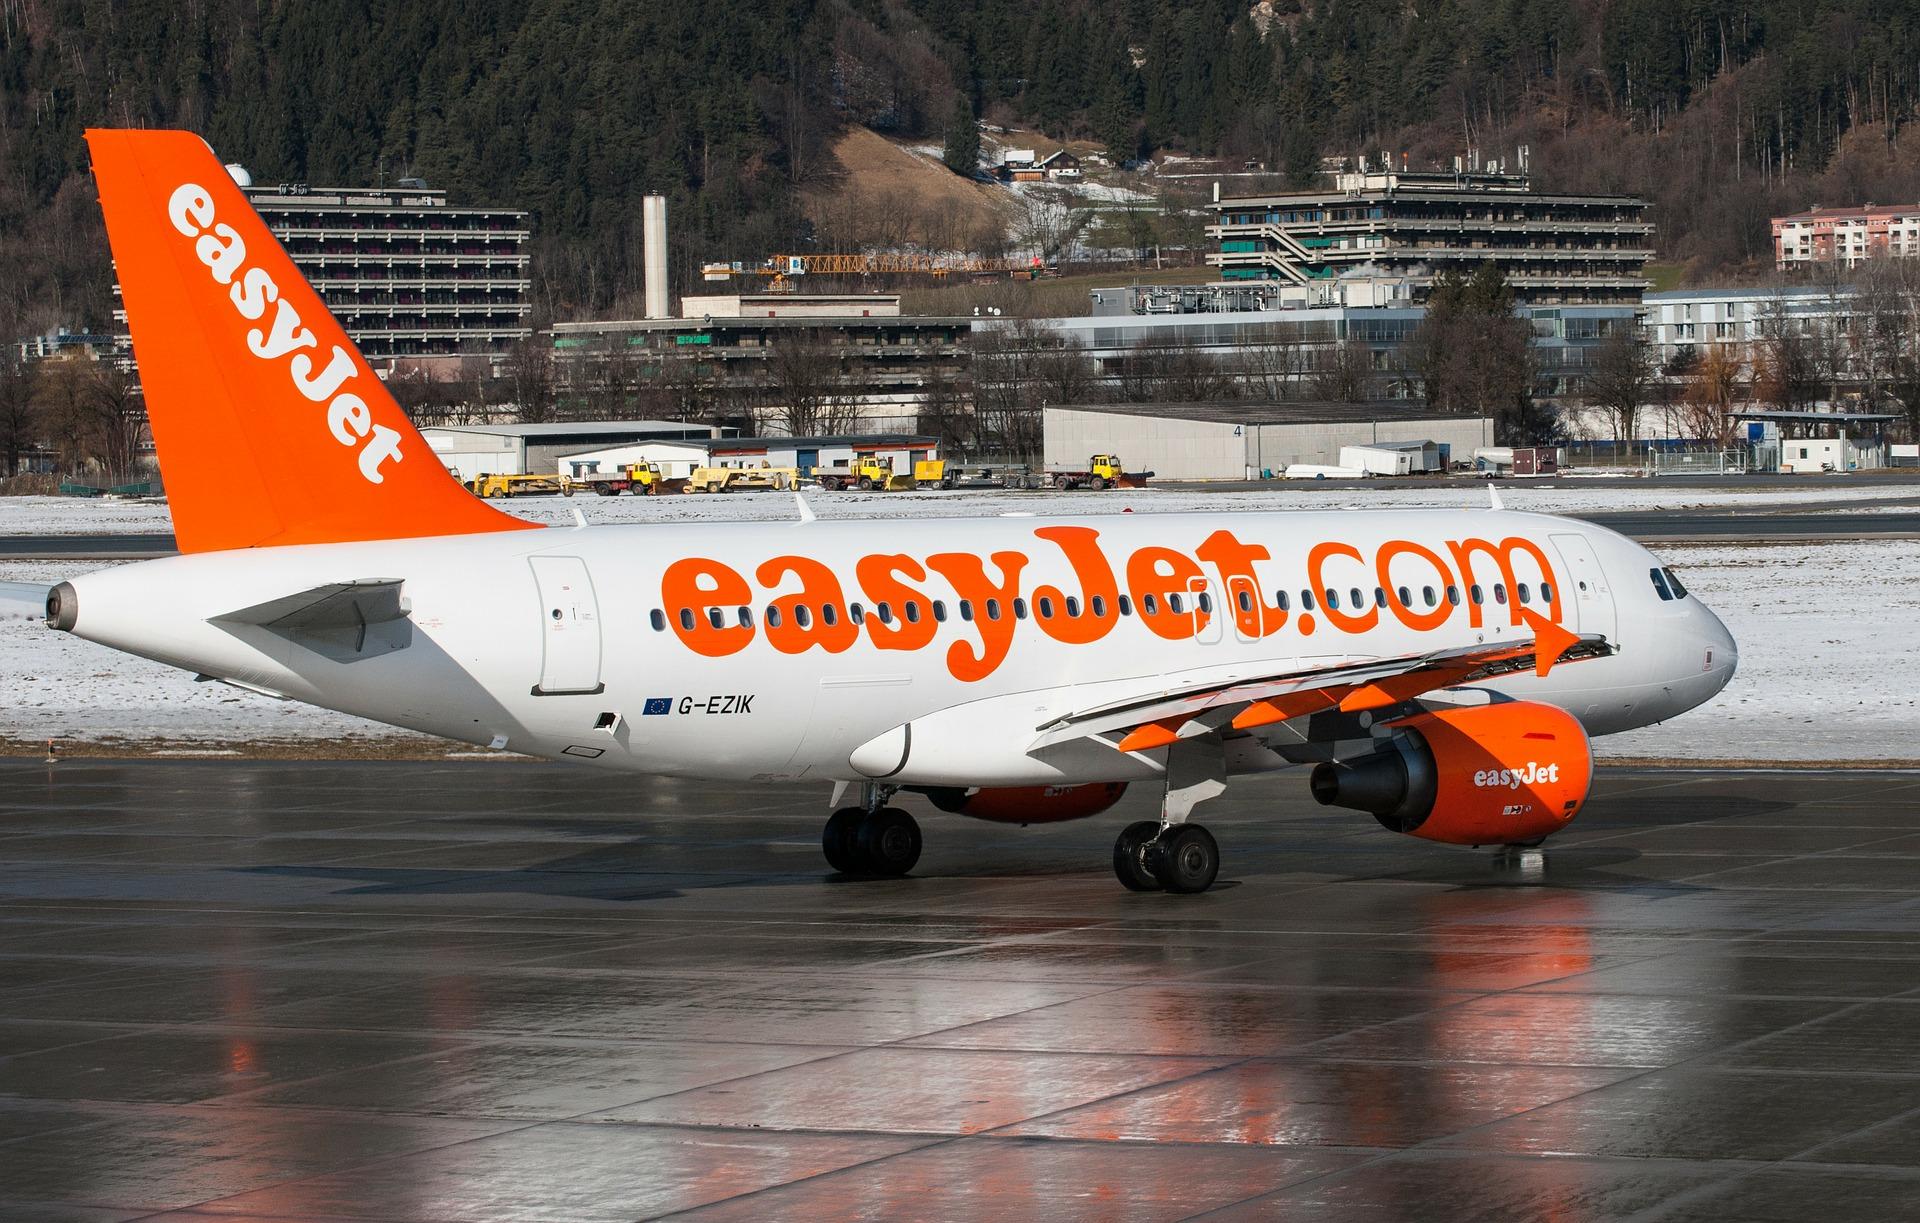 EasyJet rimborso e cambio voli per Coronavirus